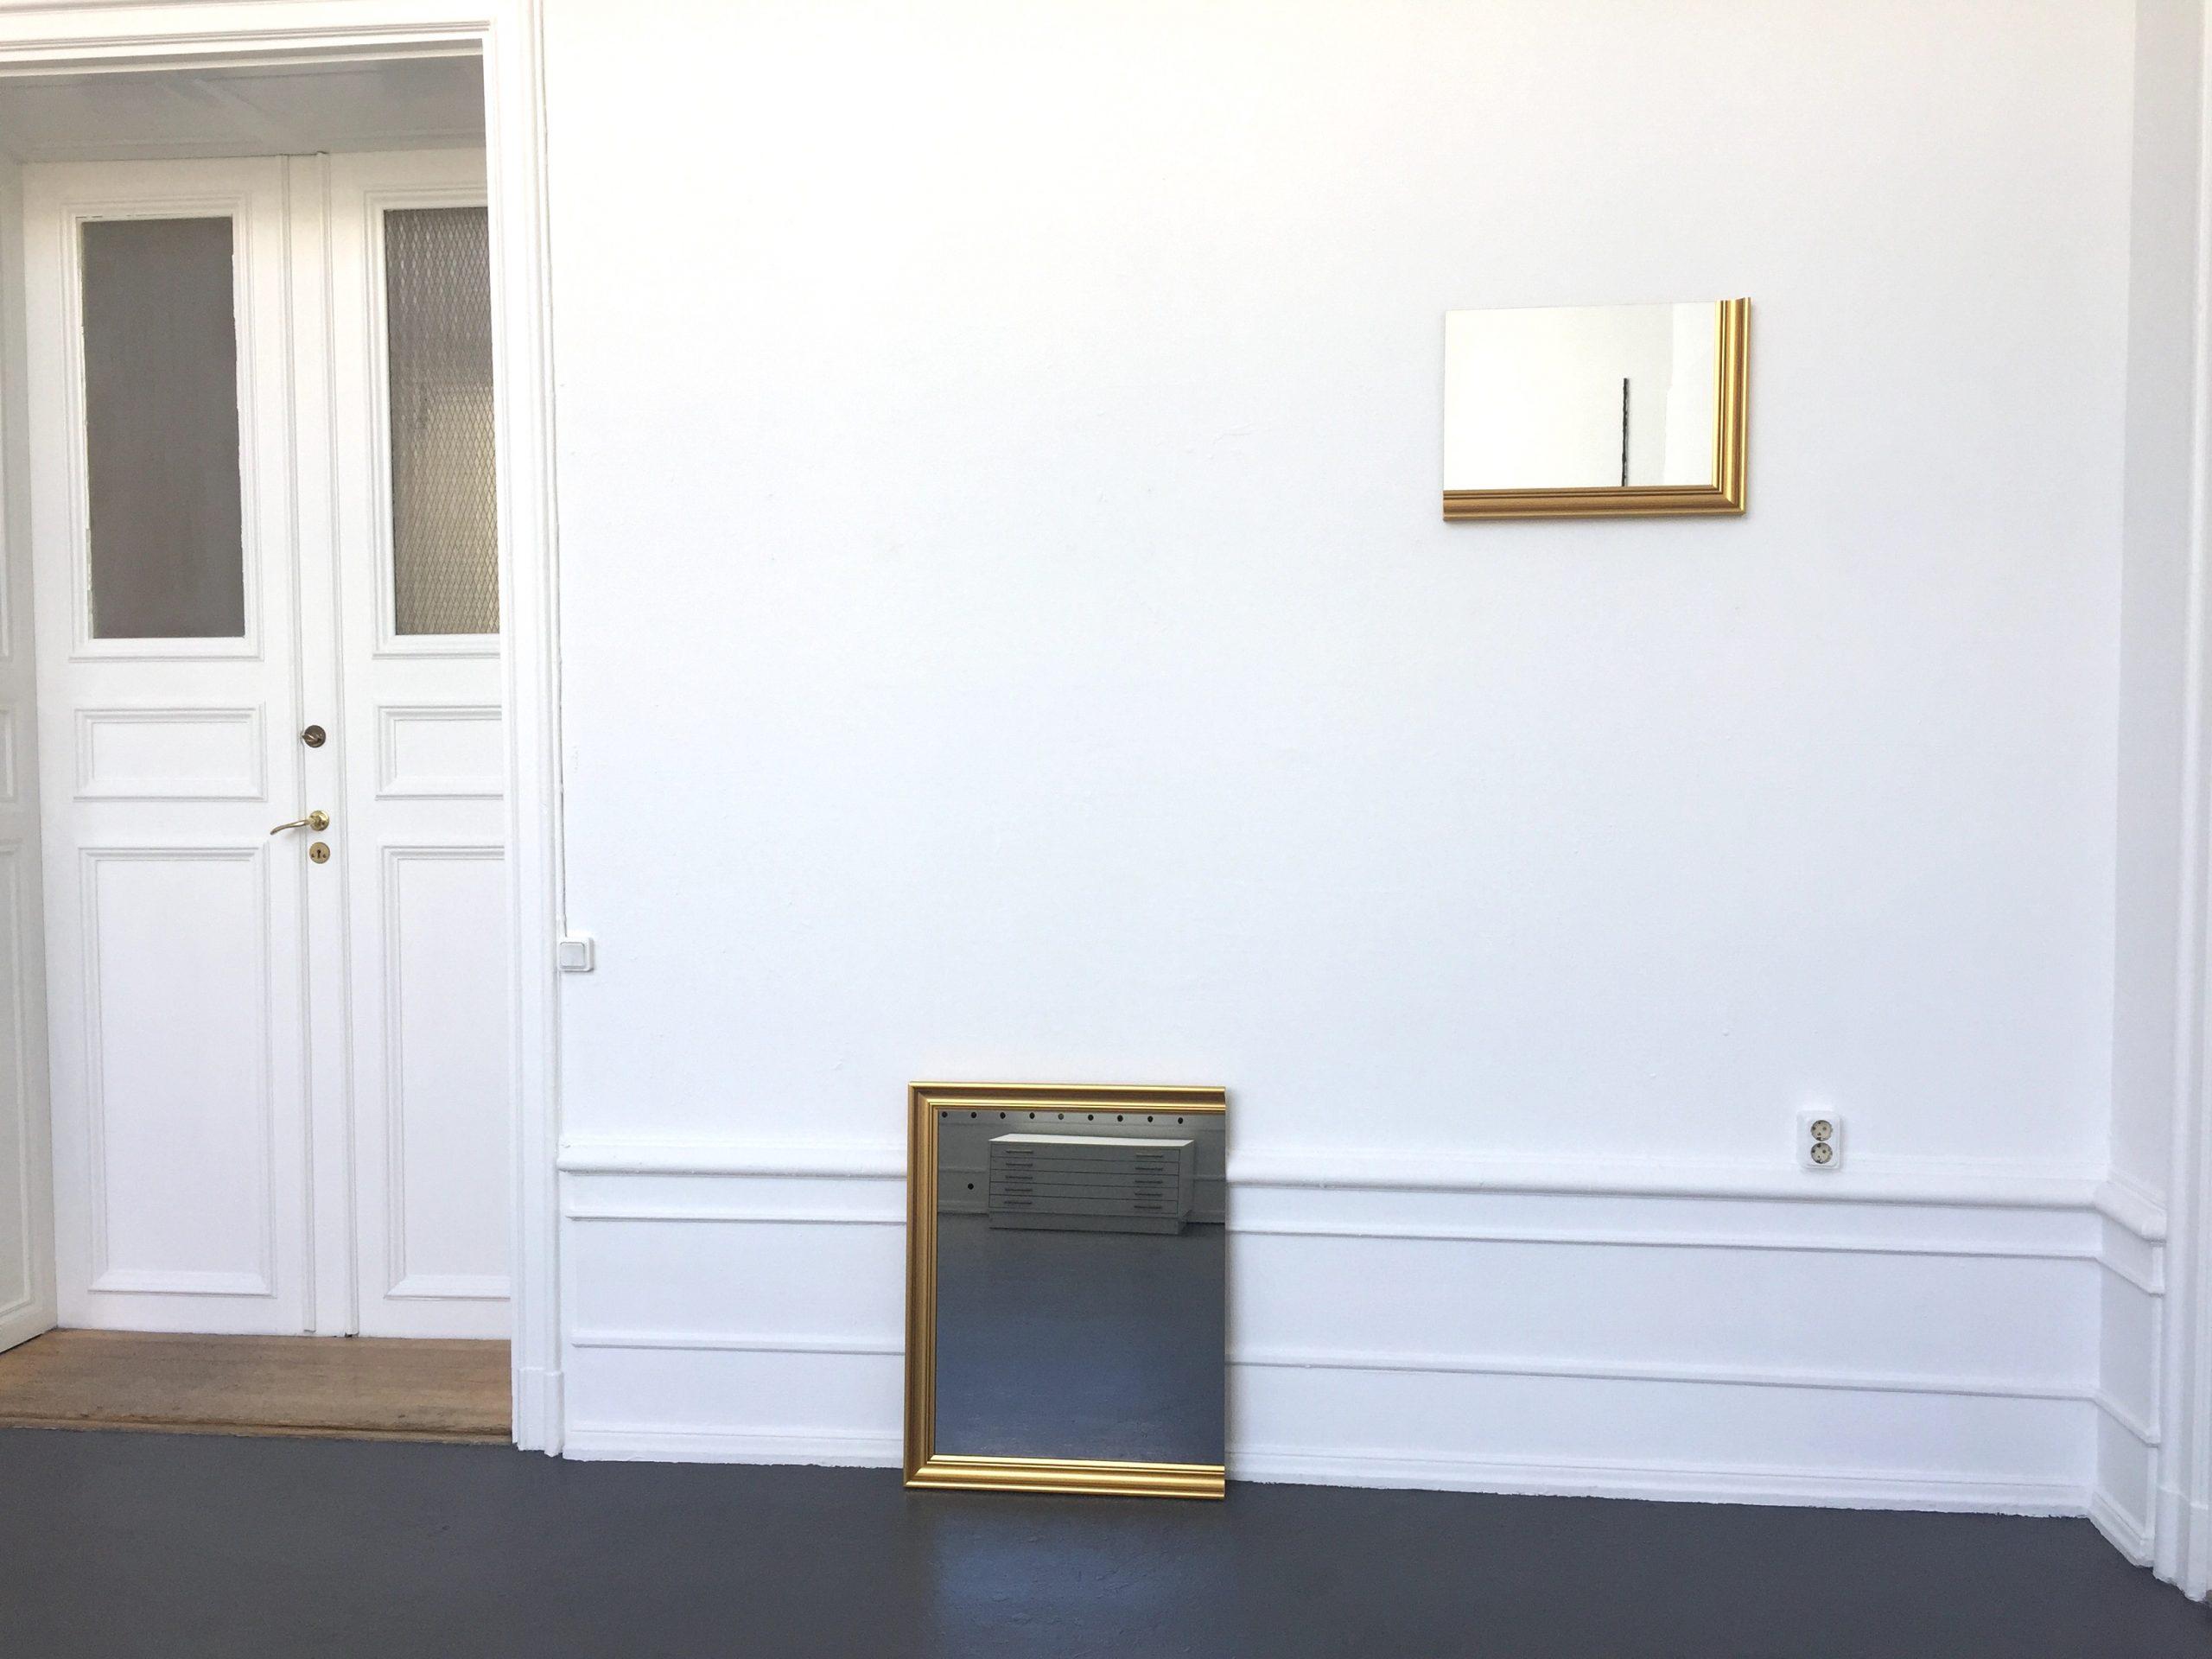 Ande och Materia / Mind and Matter, april 2020. Karin Ohlin, Mirror object VII, 2010-2013 Dark mirror glass, gilded wooden frame 60 x 75 cm, Mirror object V, 2010-2013 Mirror glass, gilded wooden frame, 38 x 53 cm